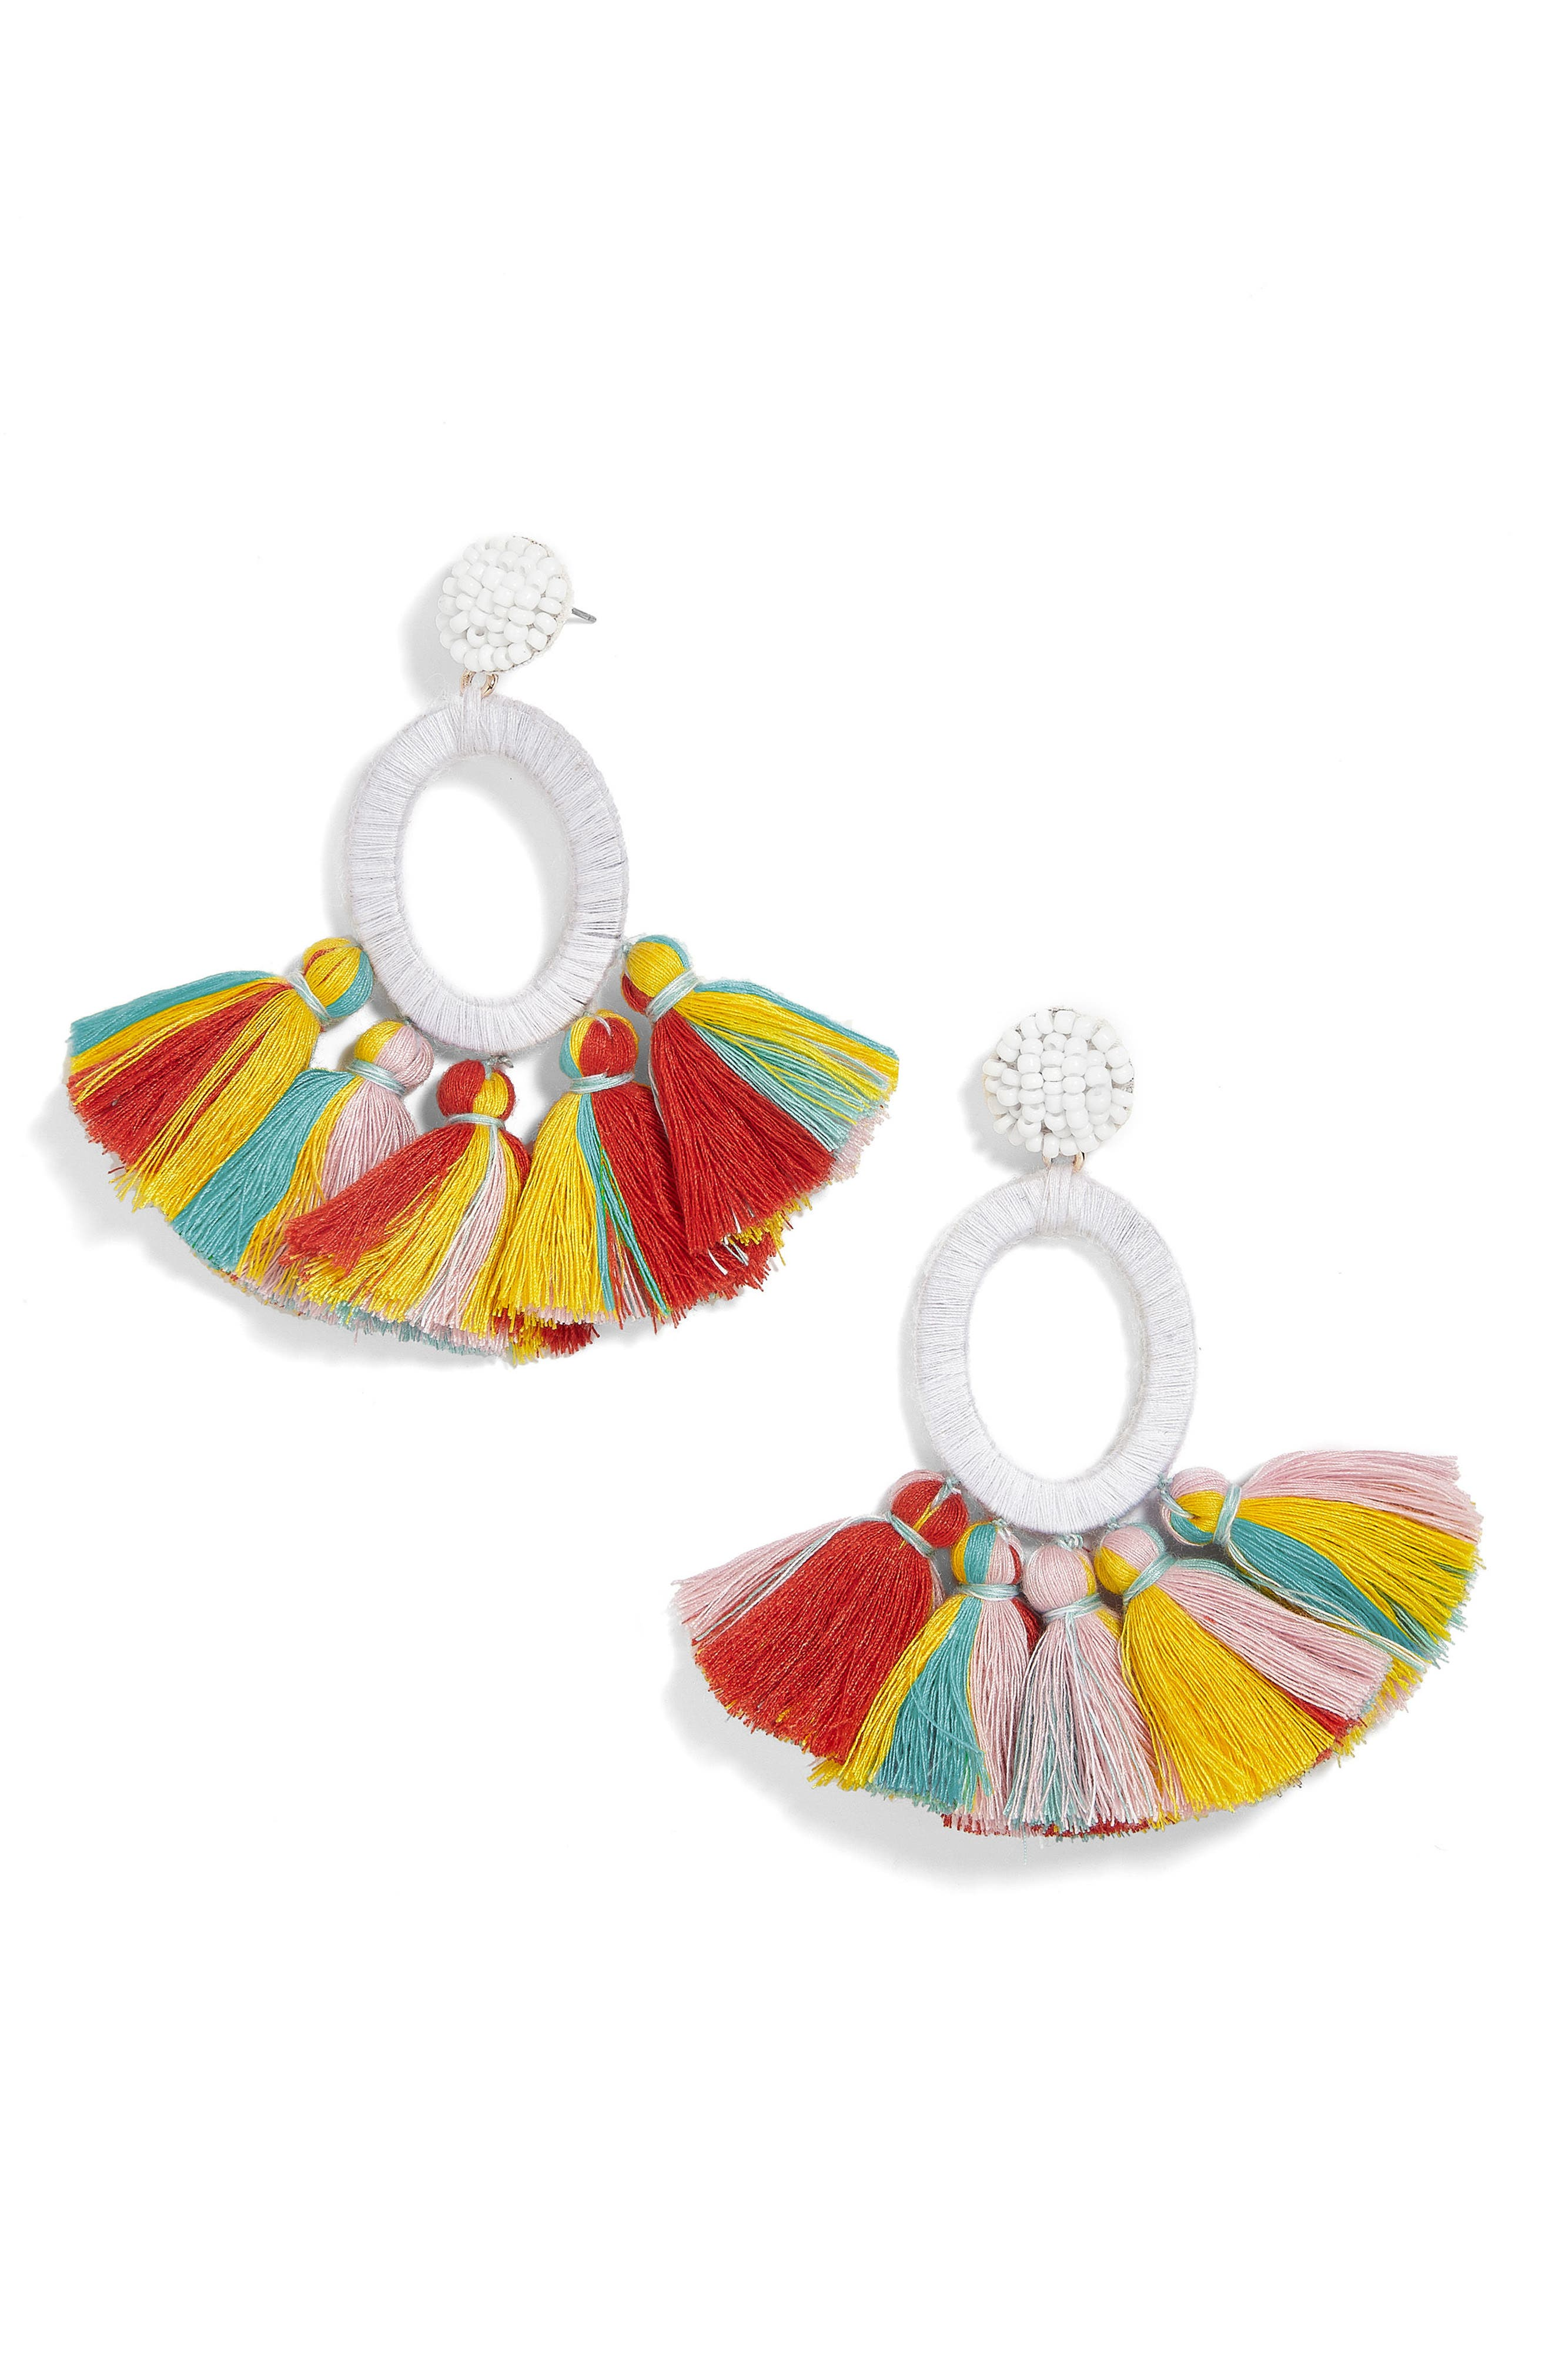 Abacos Tassel Earrings,                         Main,                         color, 159